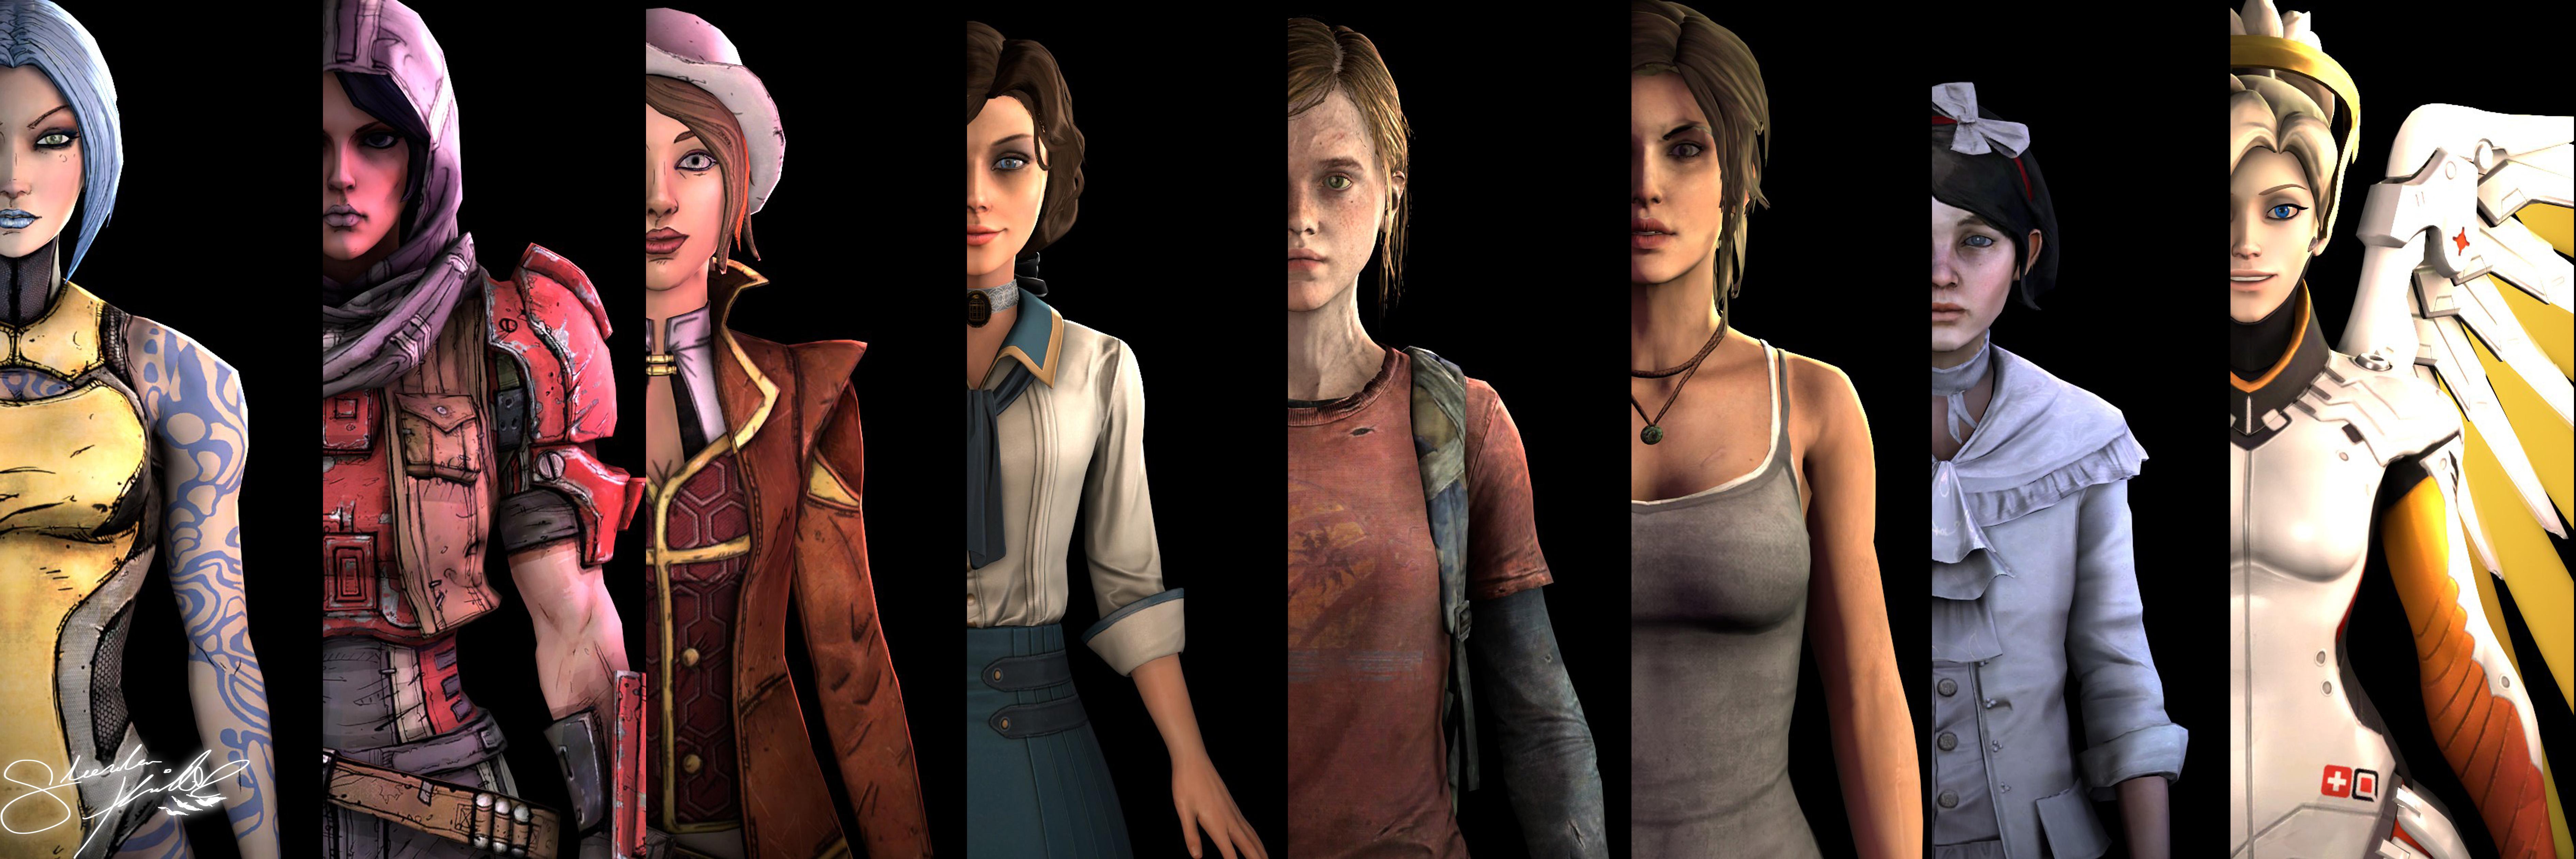 My Favorite Female Video Game Characters by SlendersKid on ...